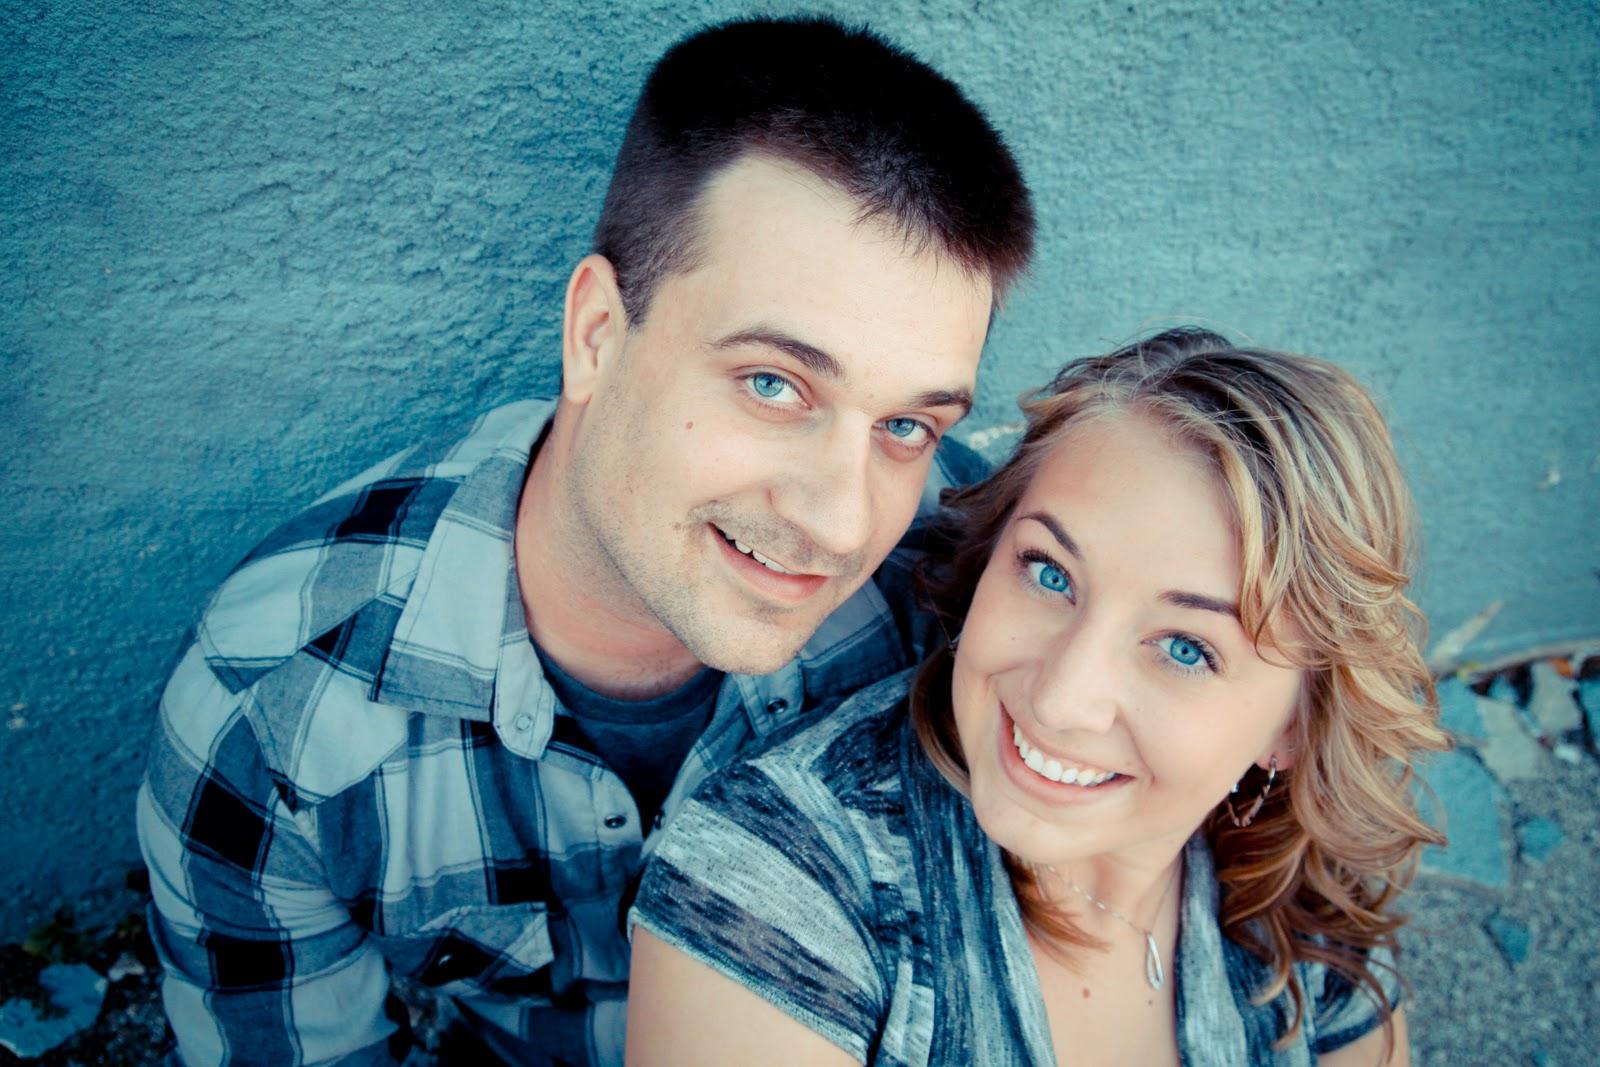 http://1.bp.blogspot.com/_aBkWiTUIh0E/TNmsw2WUvZI/AAAAAAAAB0E/suANhq1fOFw/s1600/Happy+Couples+Blog+%25286%2529.jpg